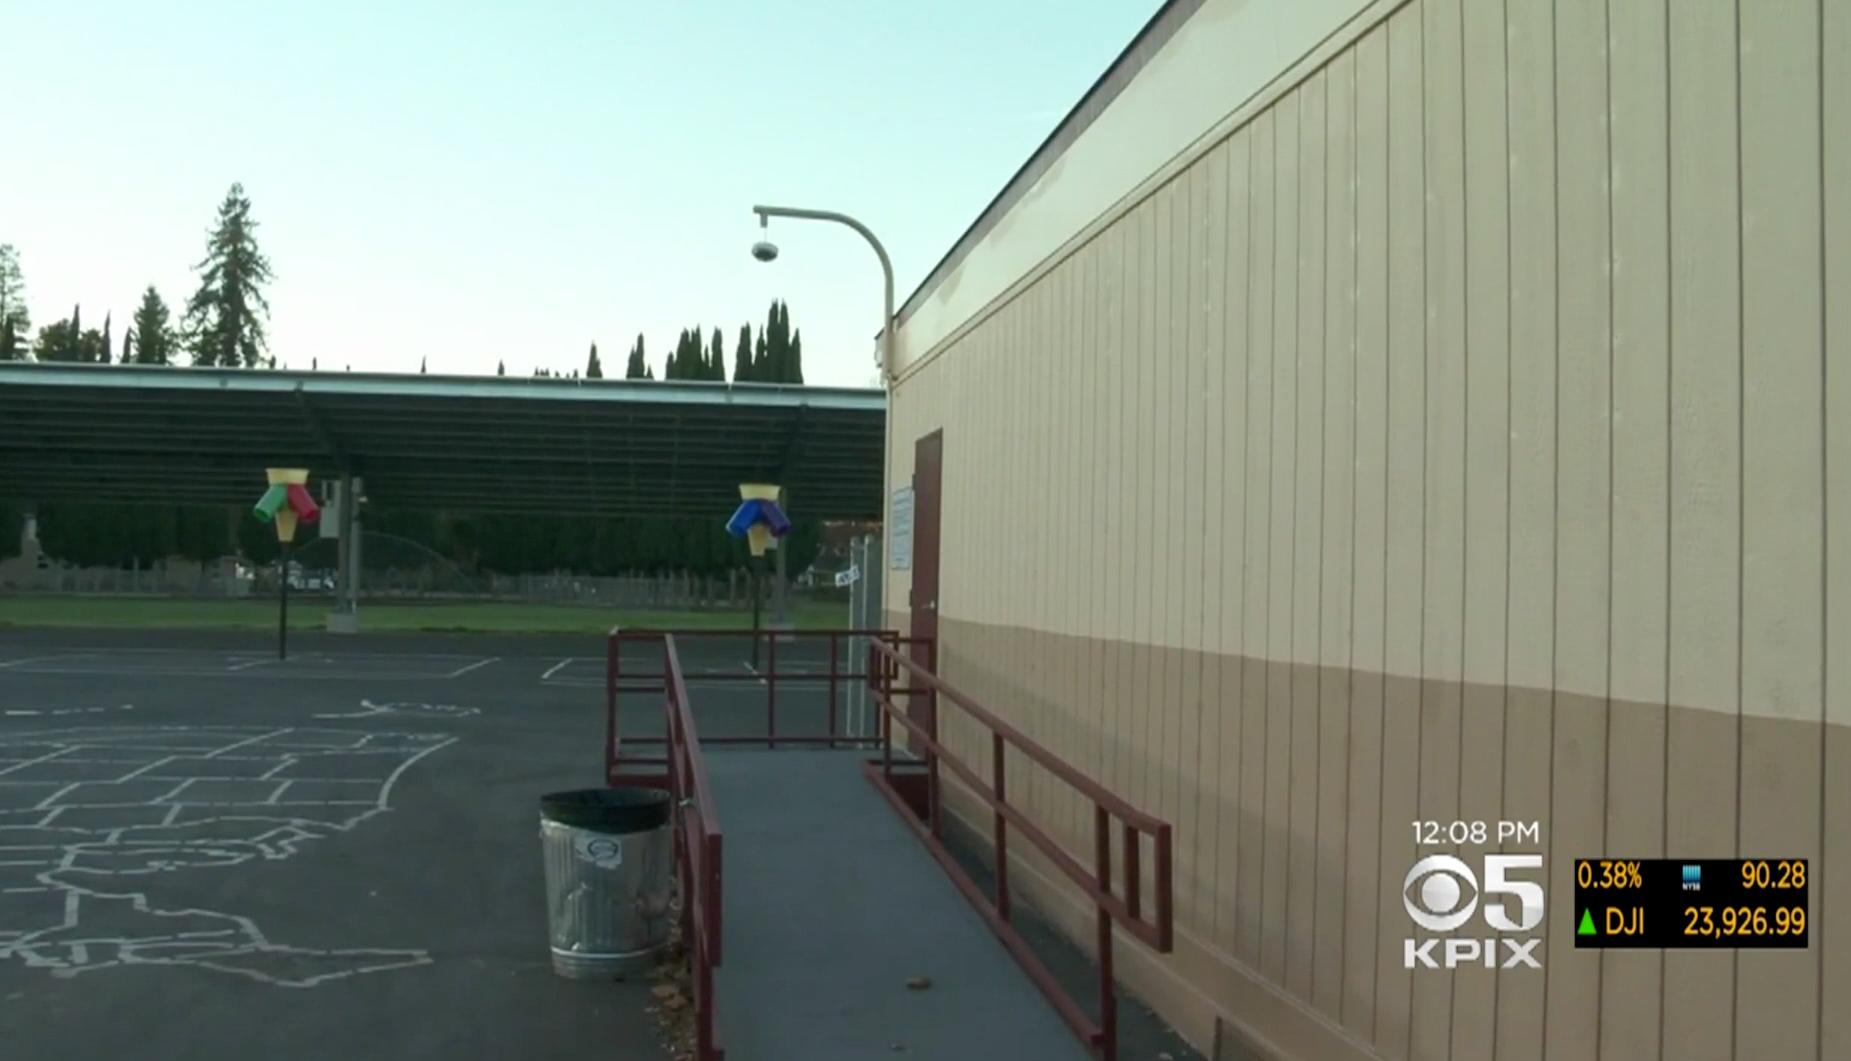 Booksin Elementary School, San Jose, California